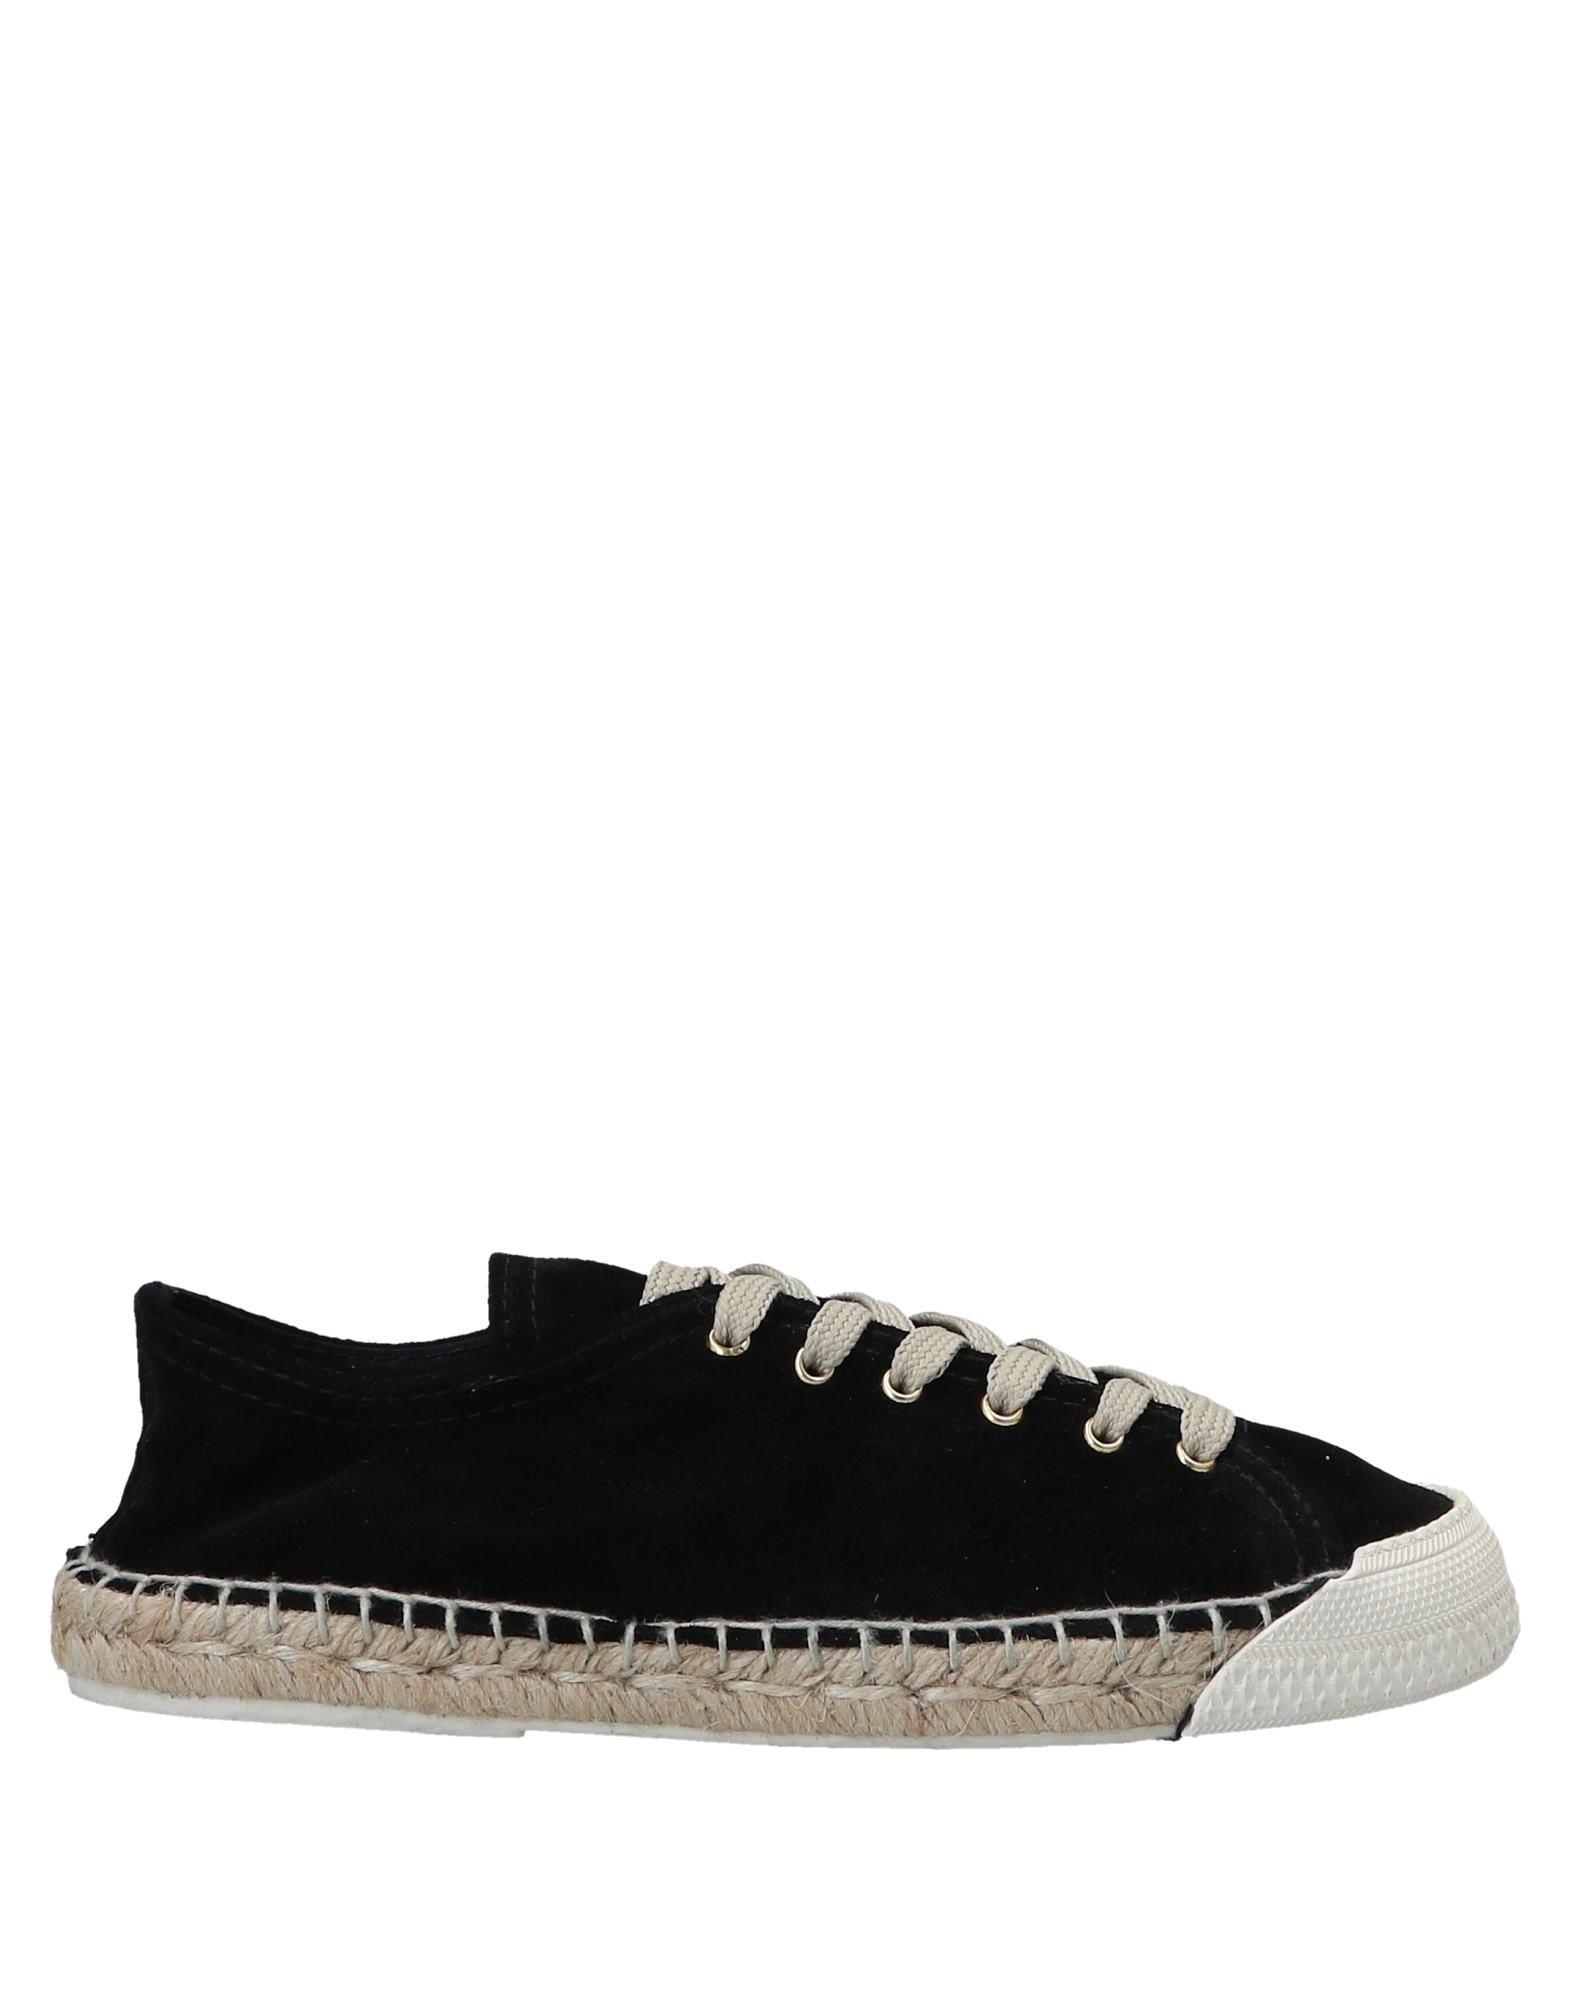 M&P Maypol Sneakers Damen  11552269EP Gute Qualität beliebte Schuhe